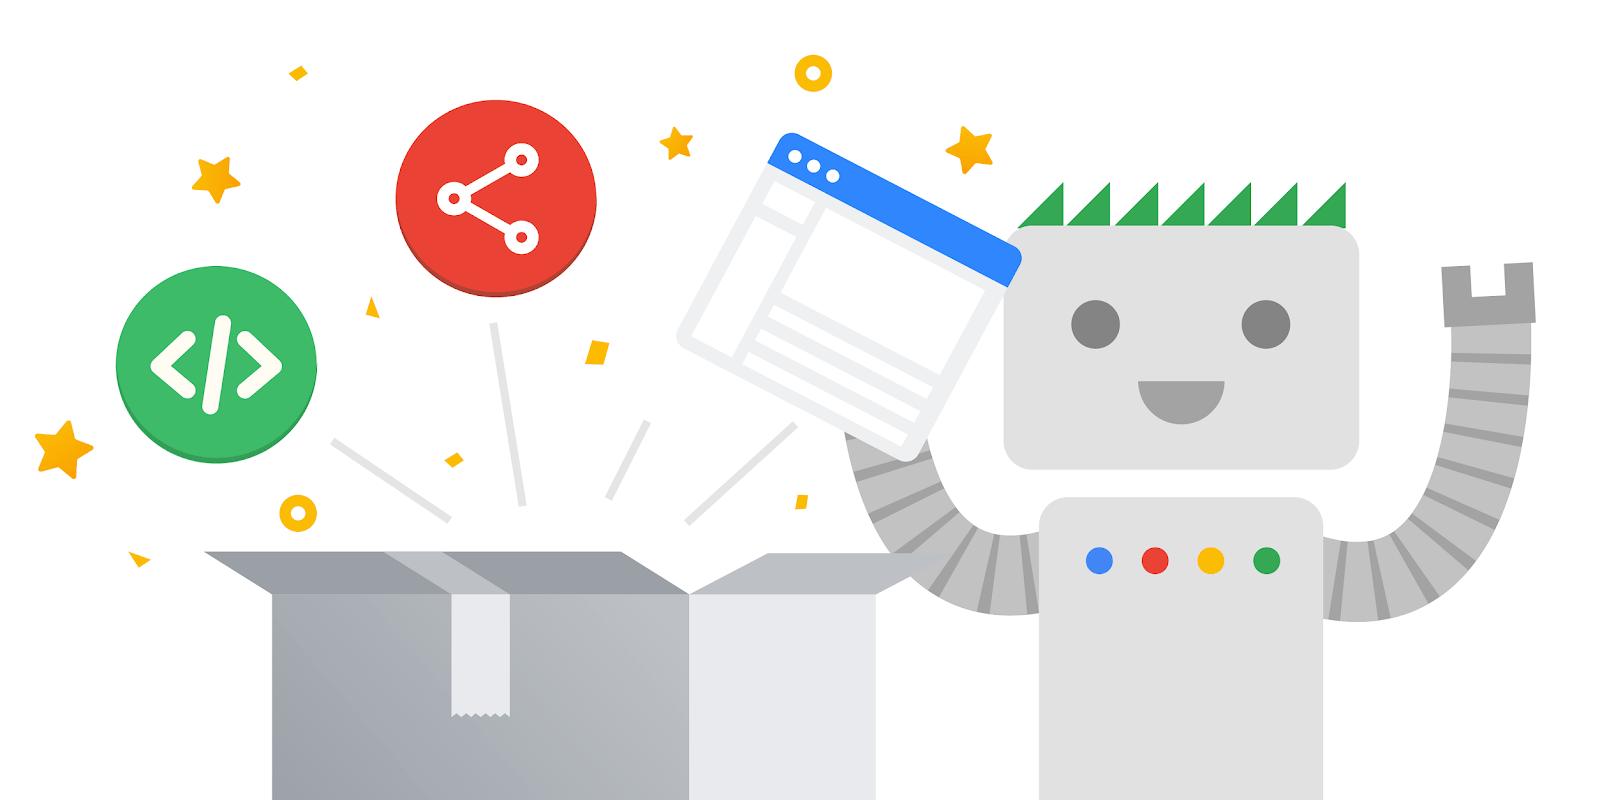 Google wants to make robots.txt an Internet standard after 25 years